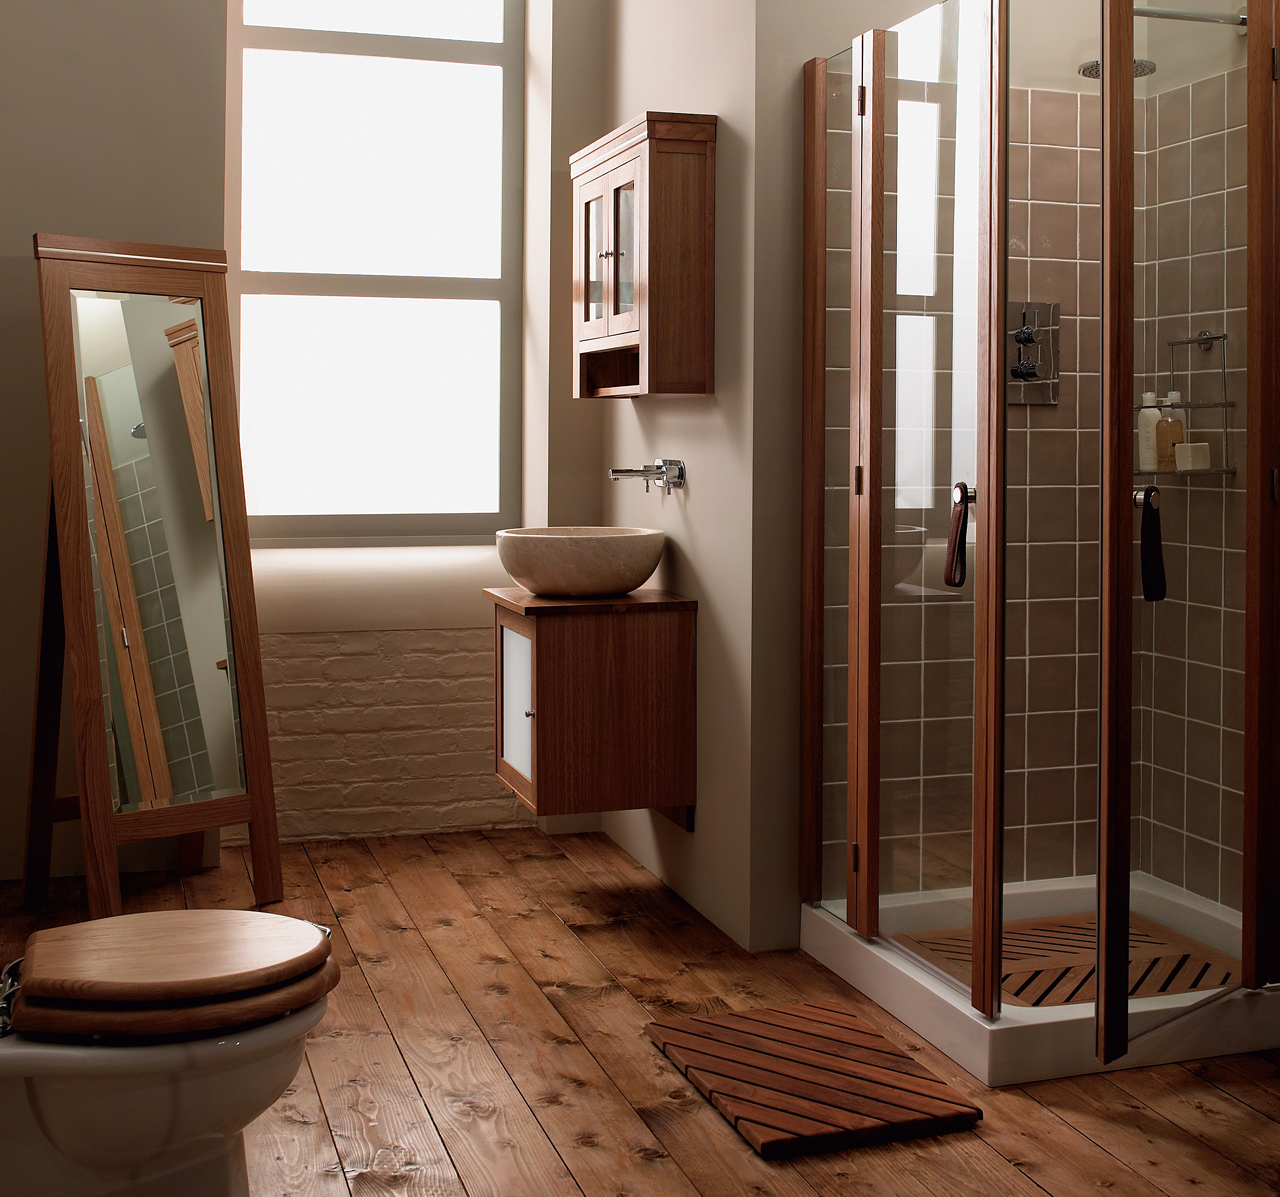 Classic Bathrooms: Imperial Bathrooms - Maypool-oak-cloakroom